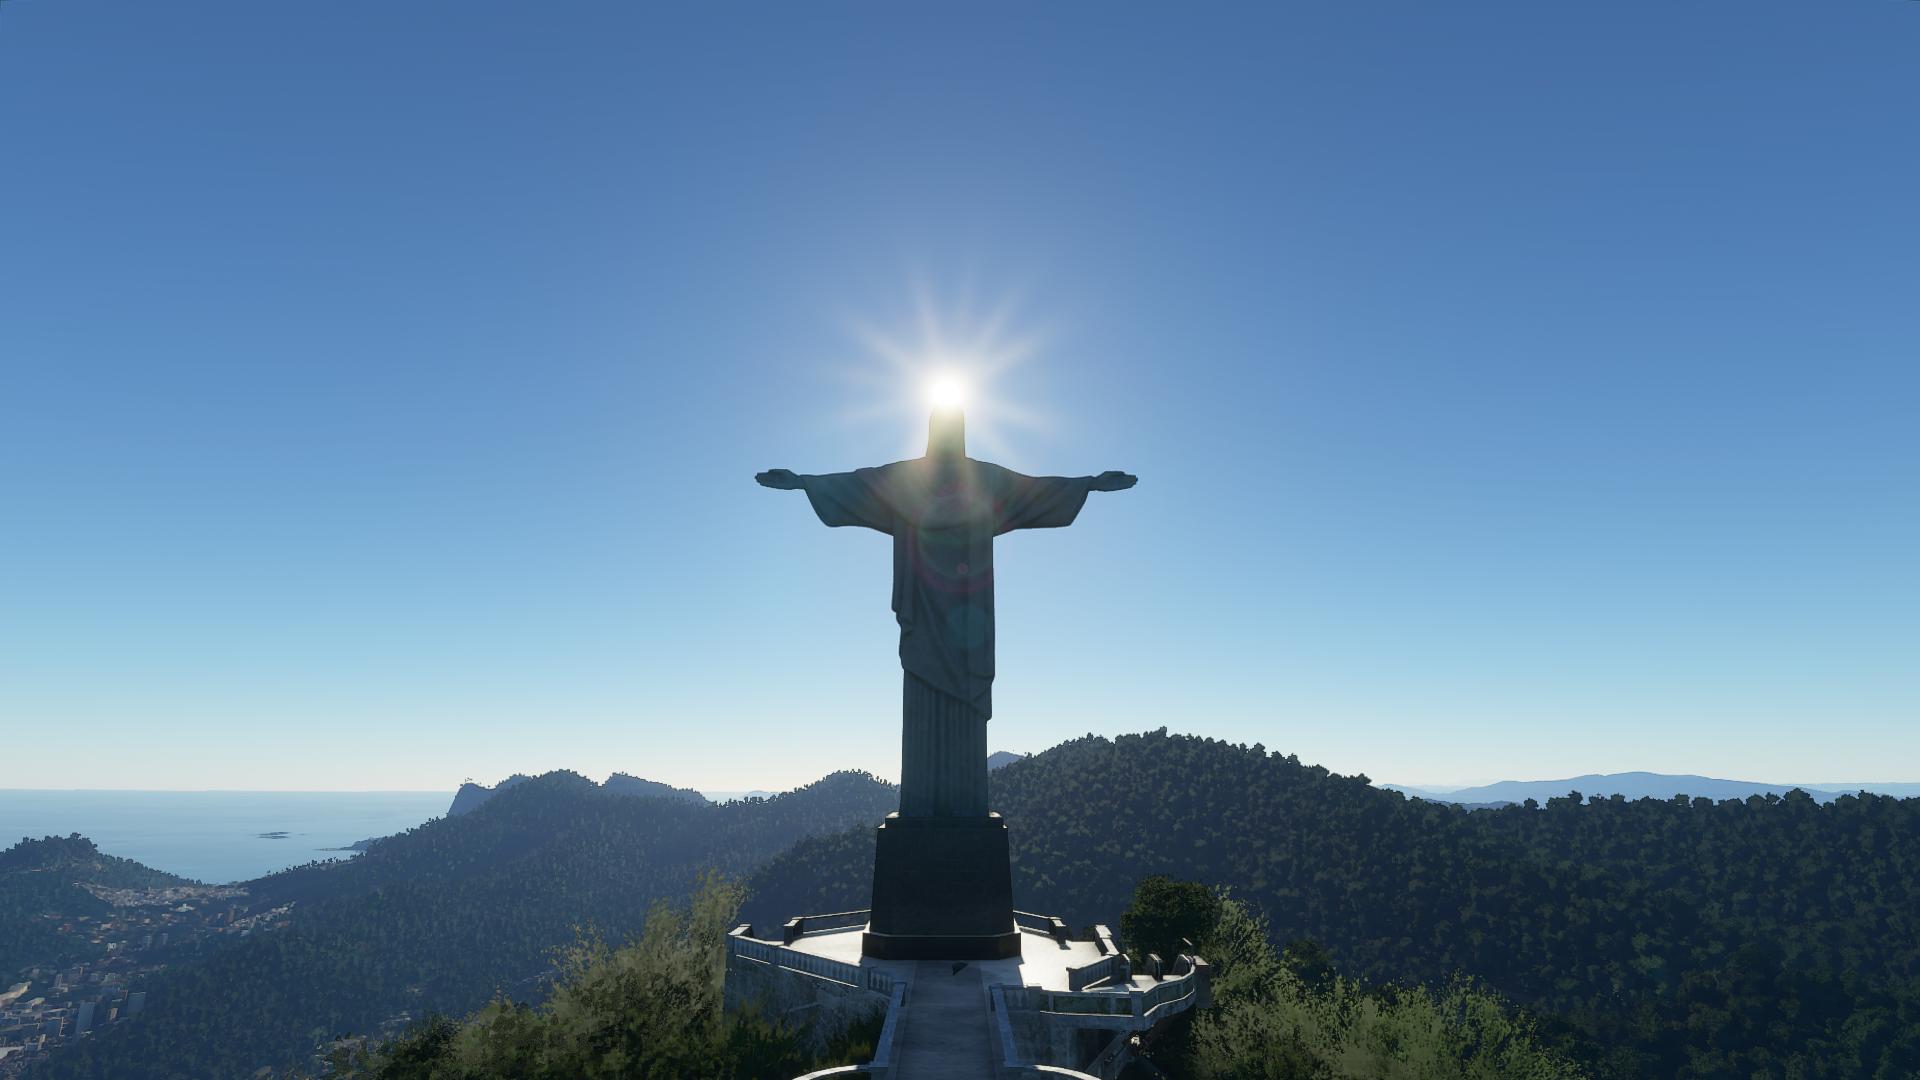 Christ the Redeemer in Microsoft Flight Simulator